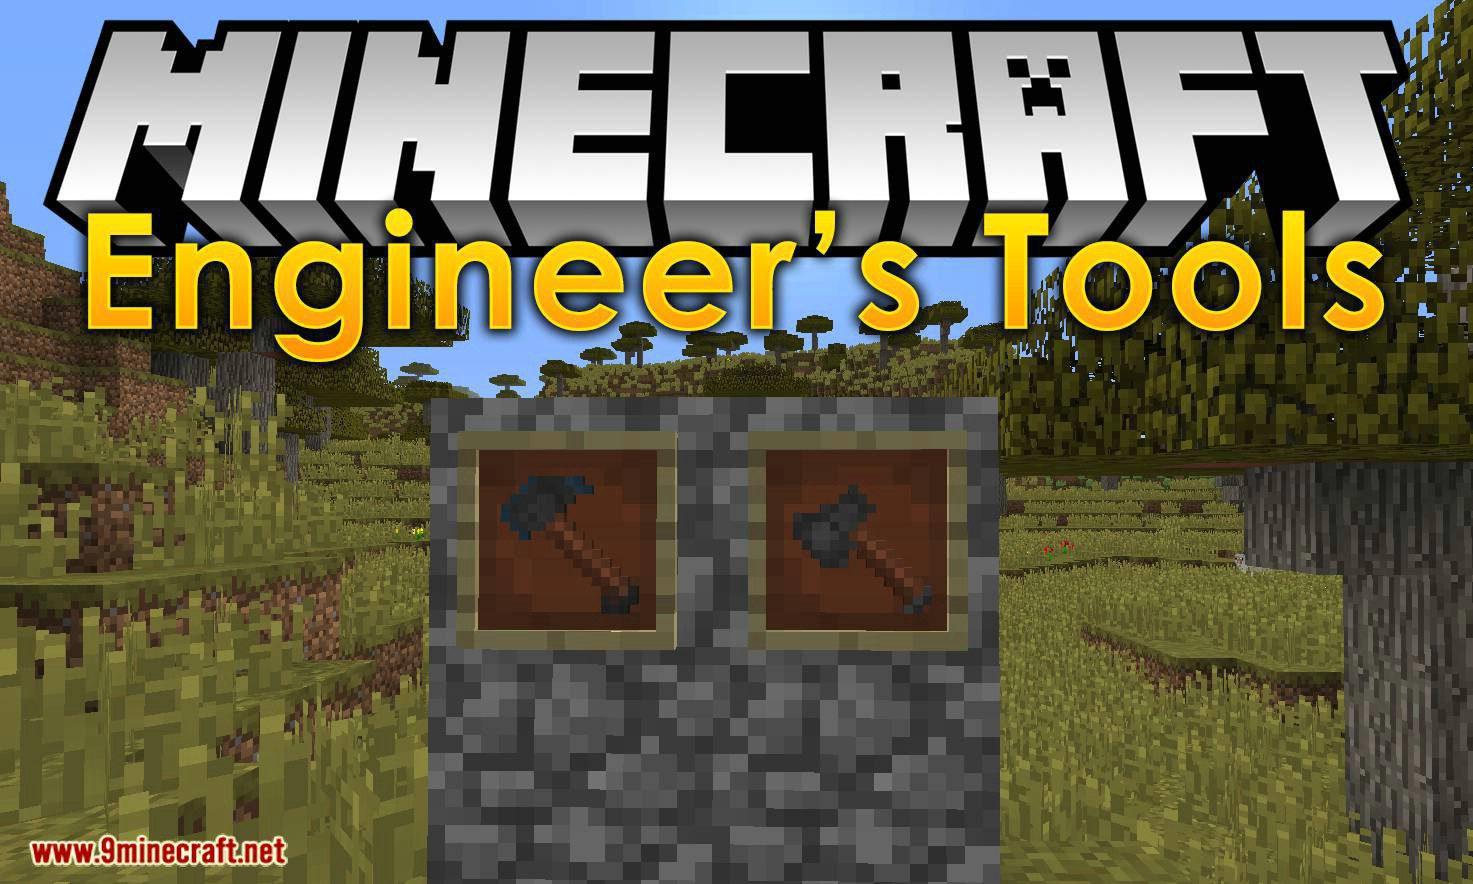 Engineer_s Tools mod for minecraft logo